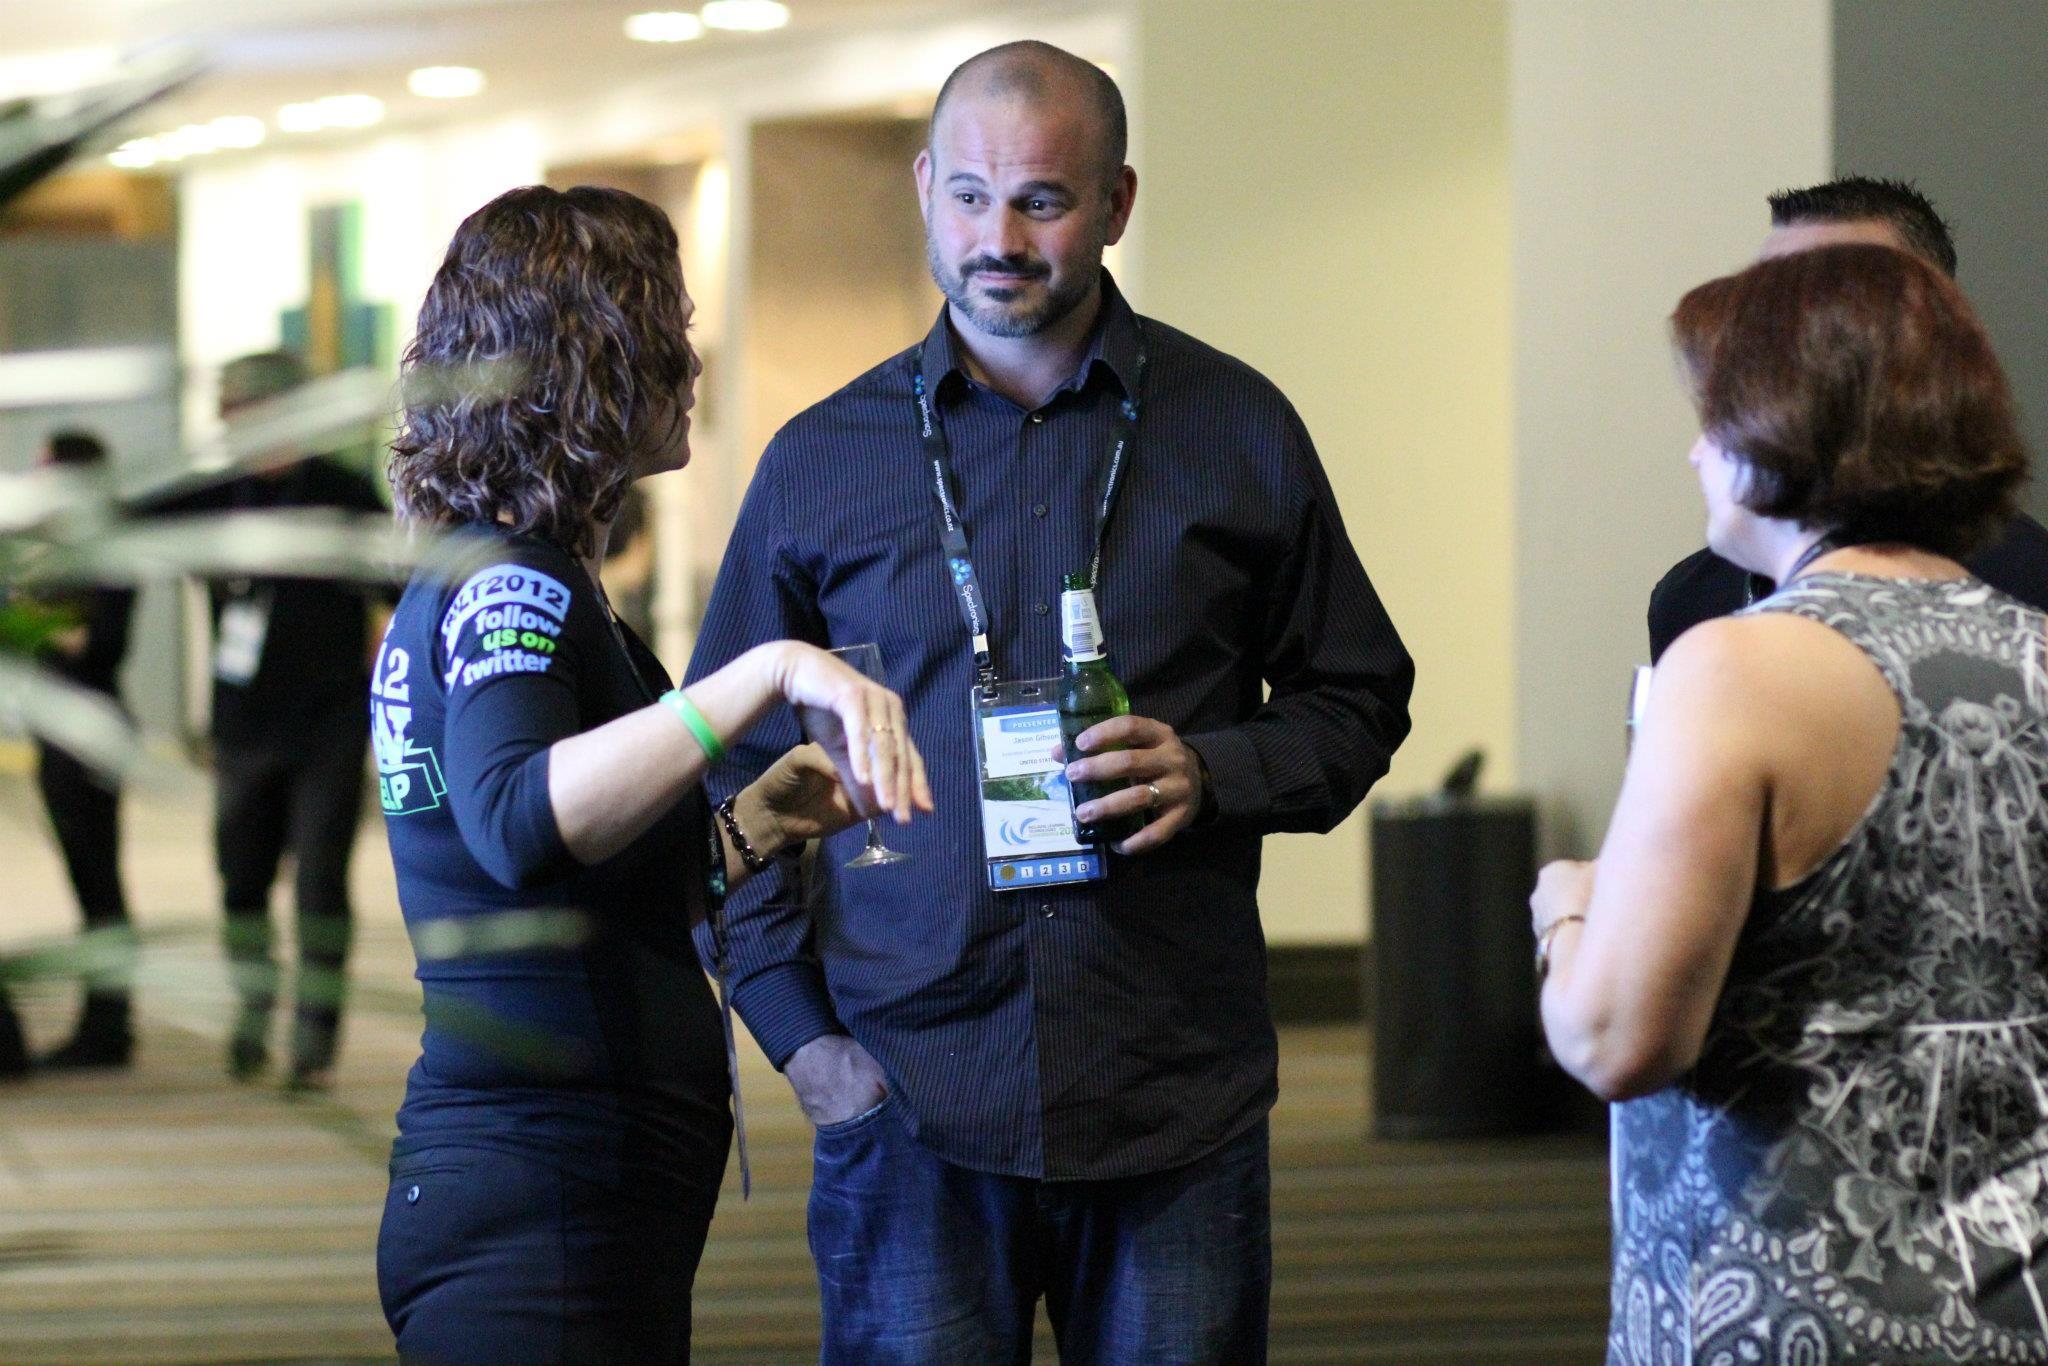 Amanda Hartmann chatting to Jason Gibson